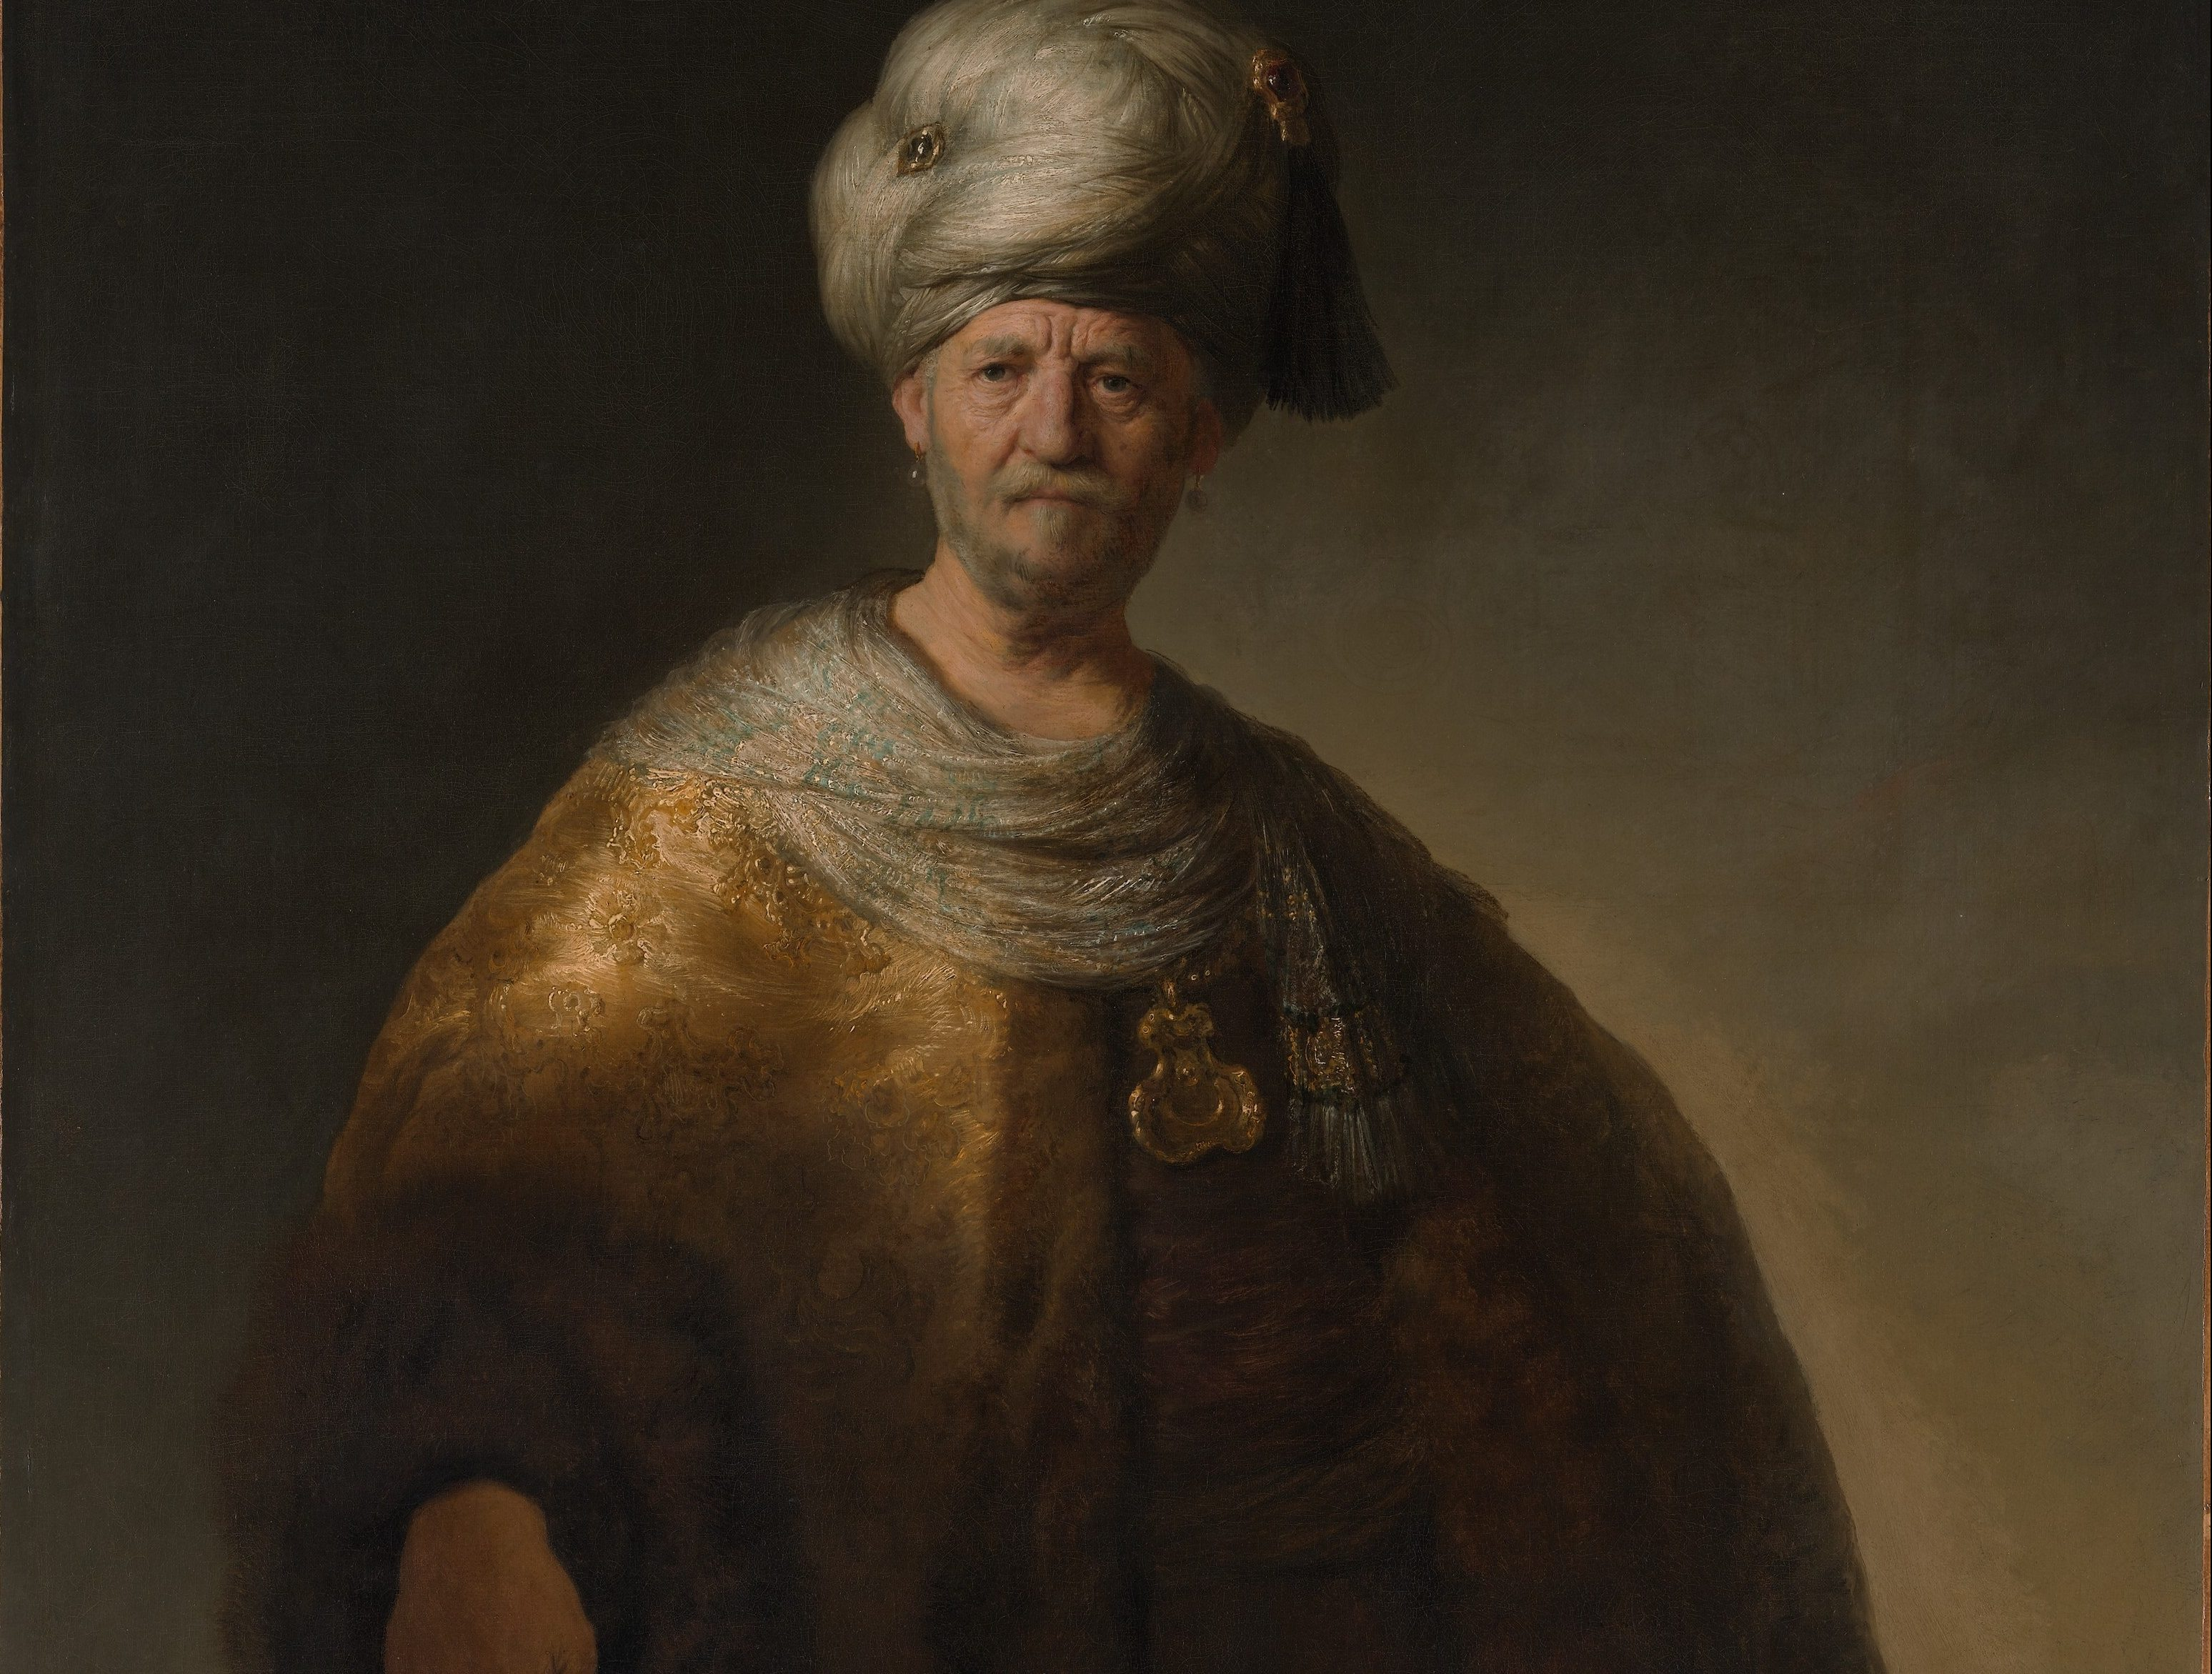 Young Rembrandt - Rising Star - CODART